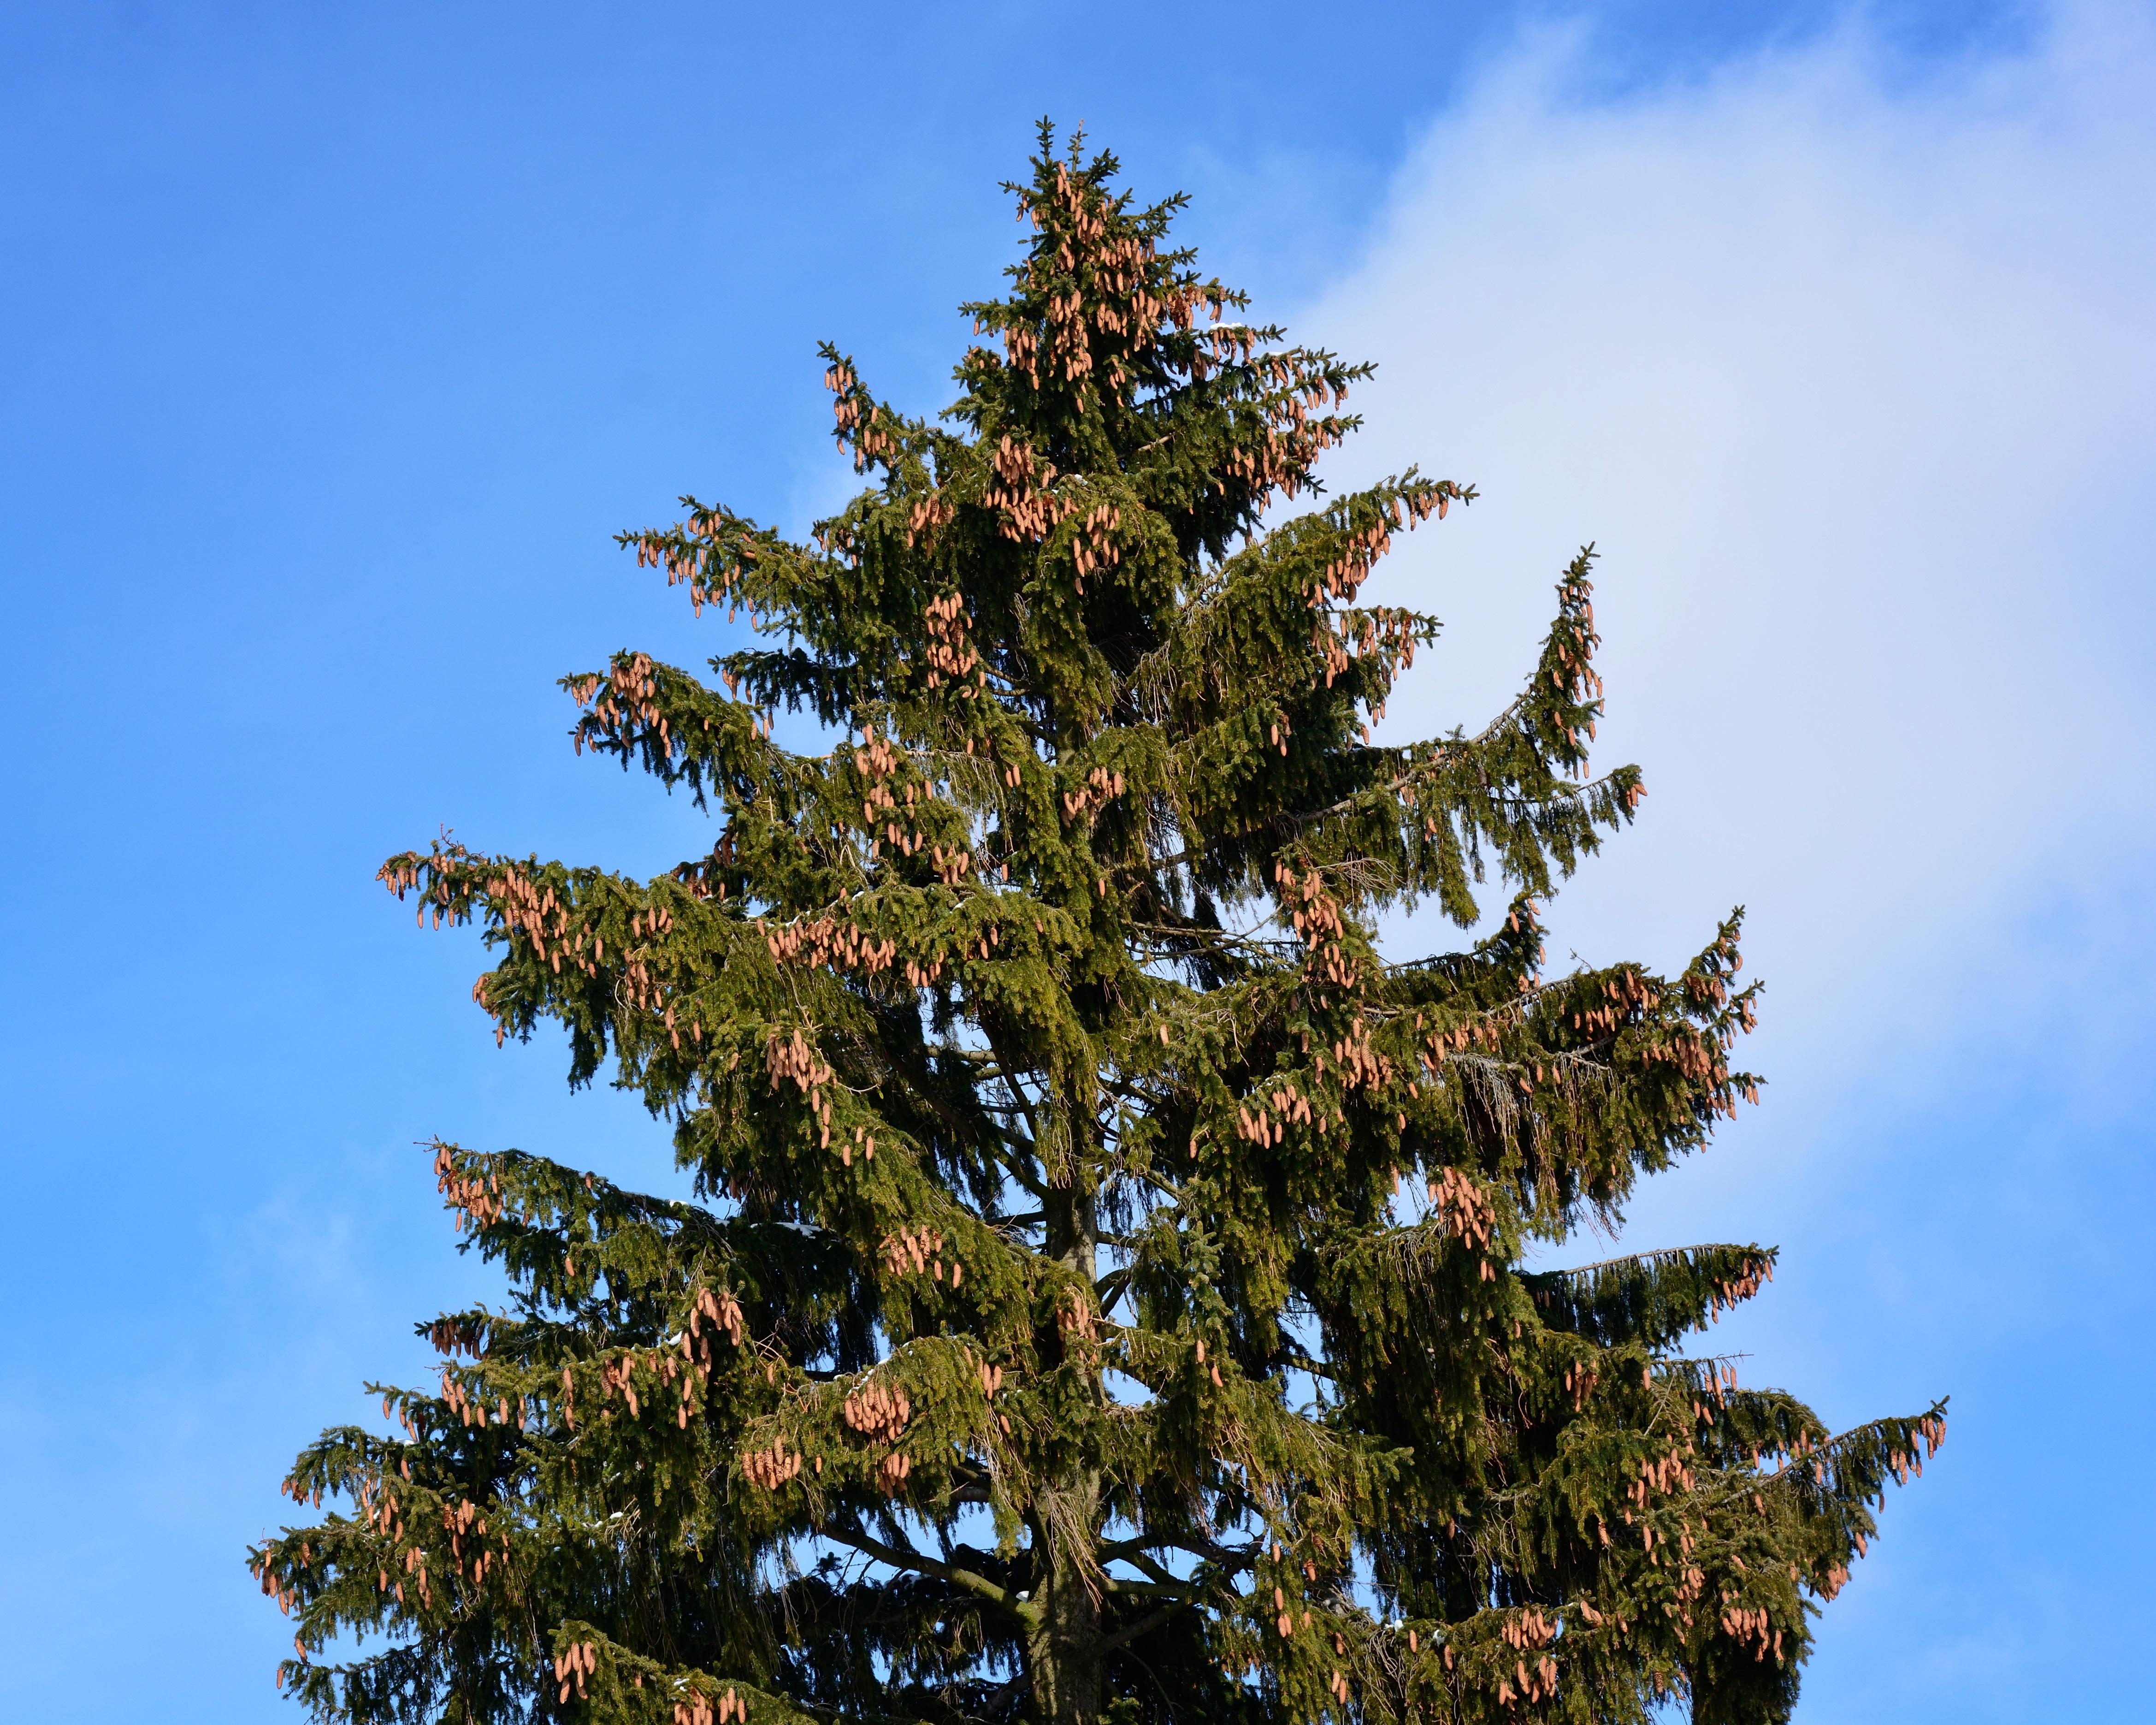 Free Images : Nature, Branch, Sky, Leaf, Evergreen, Botany